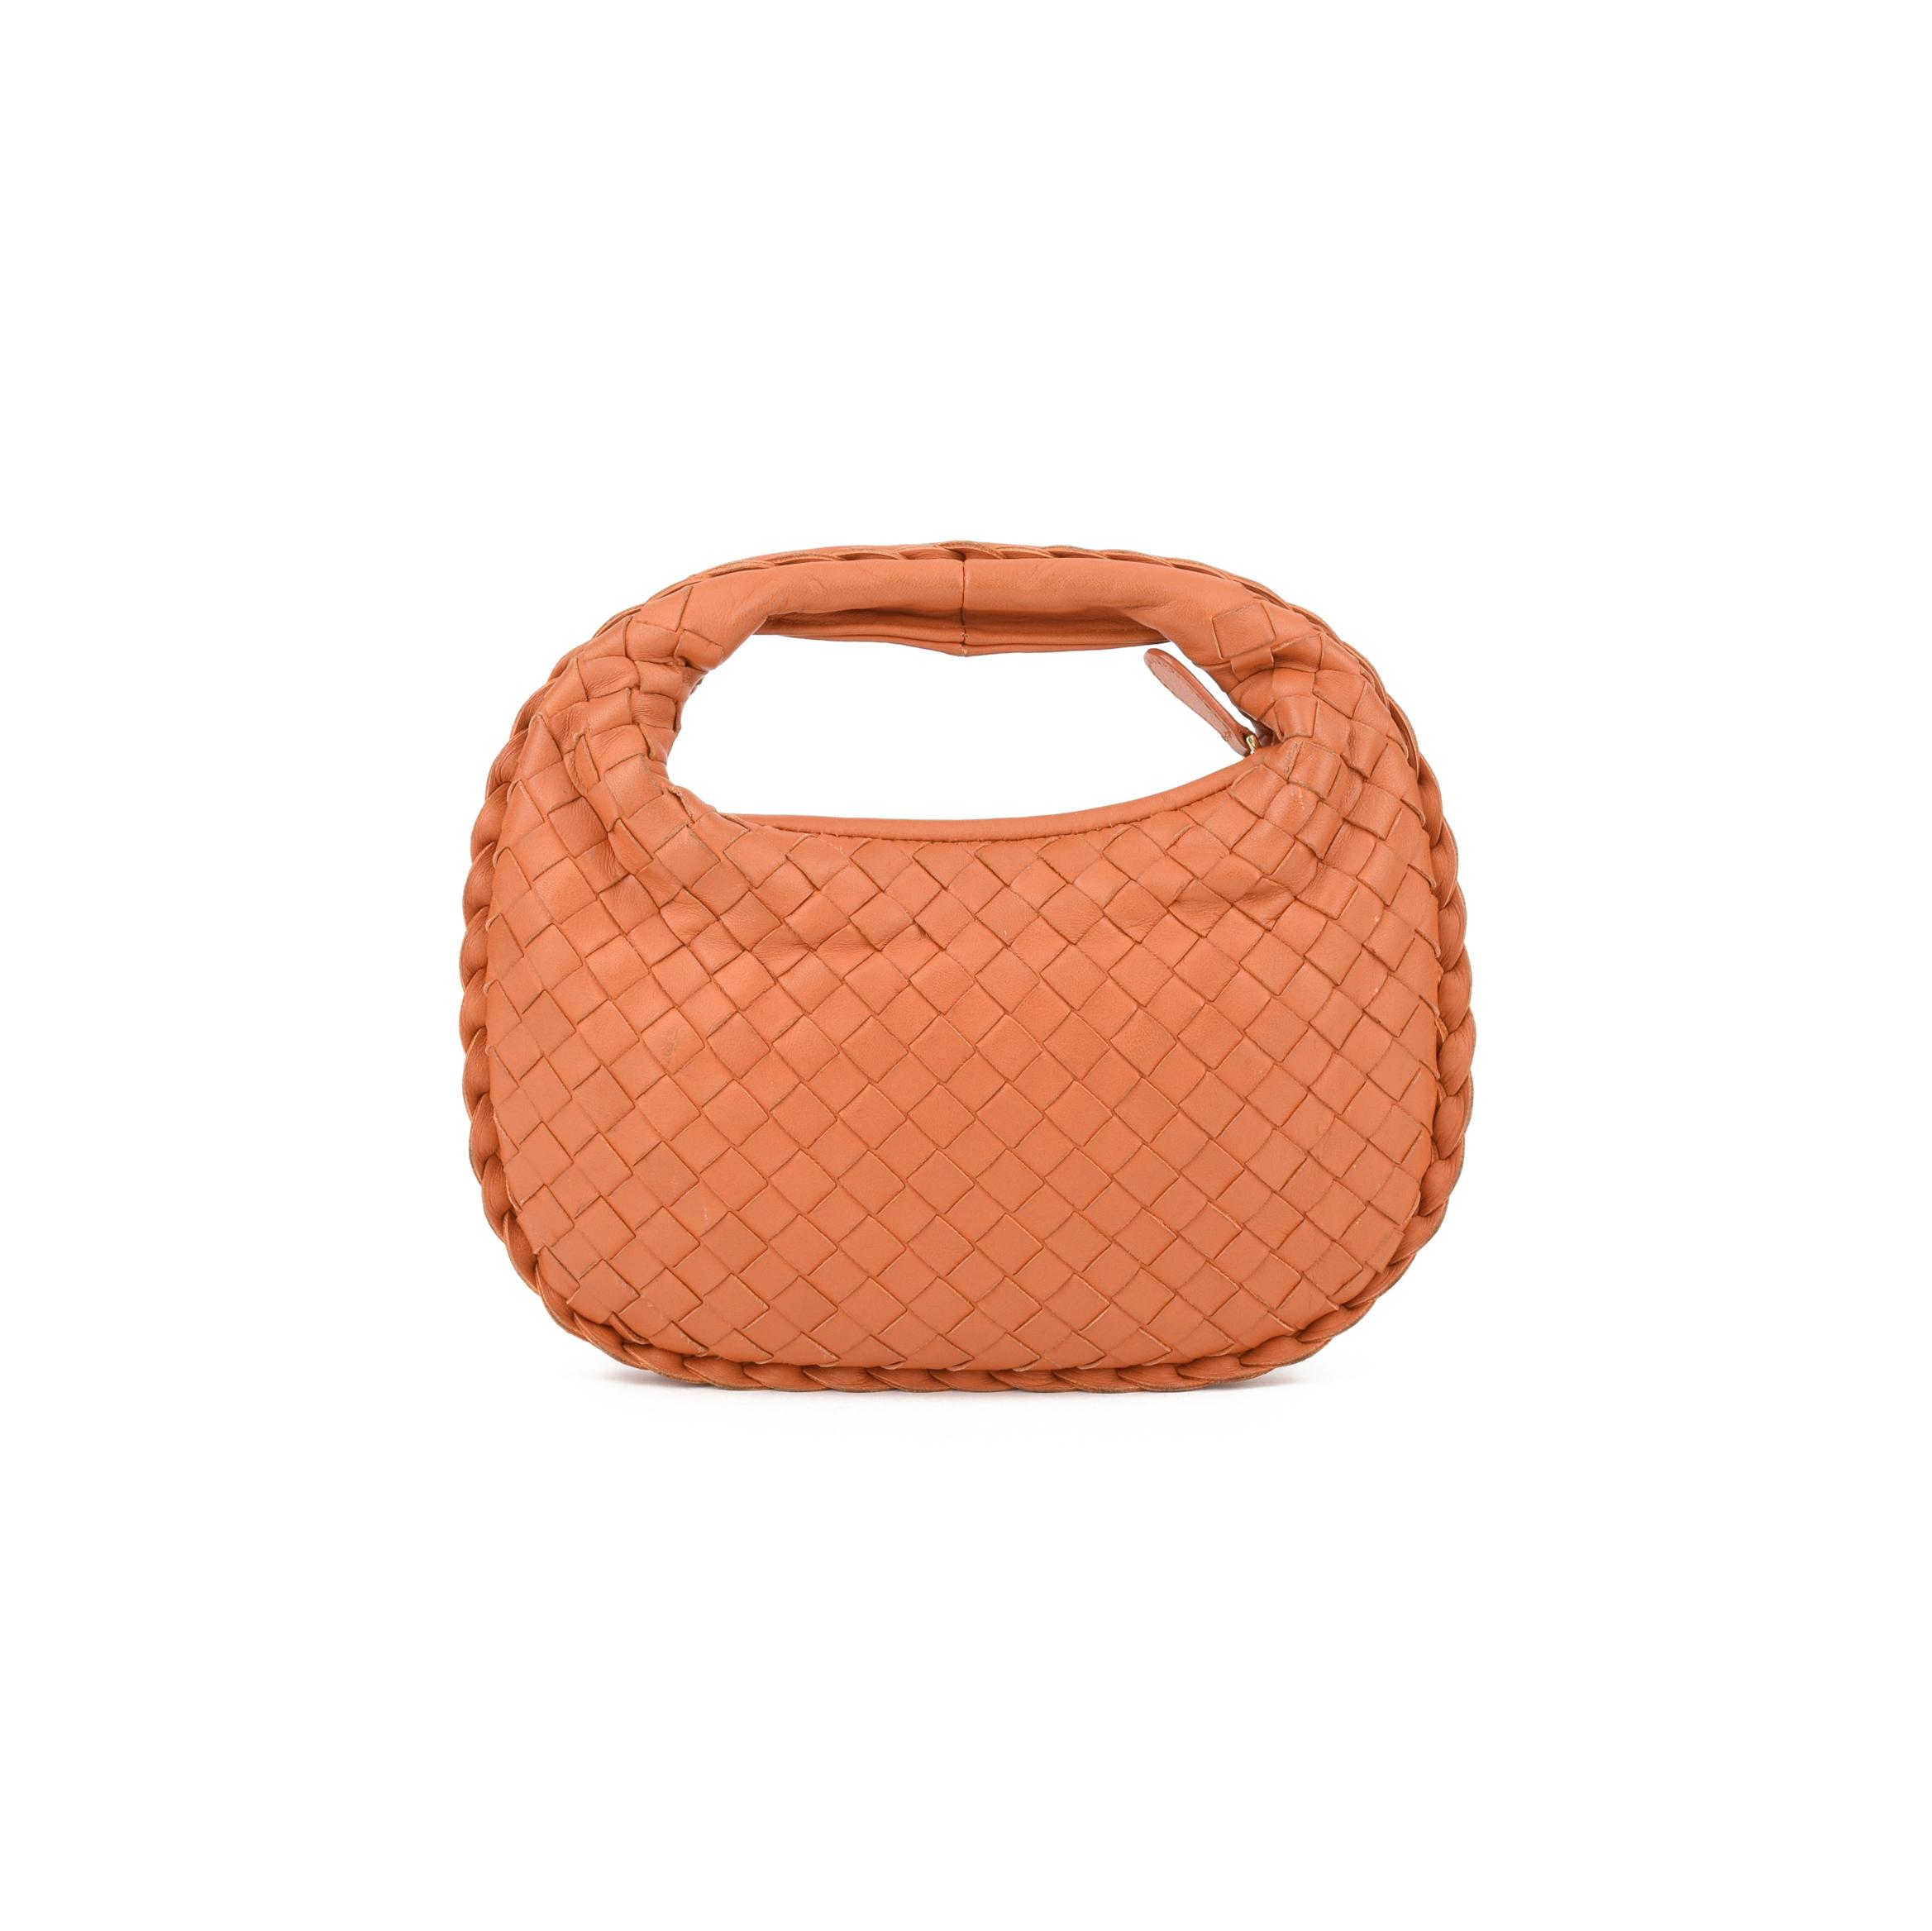 72651e880fcf Authentic Second Hand Bottega Veneta Intrecciato Mini Hobo Bag  (PSS-126-00045)